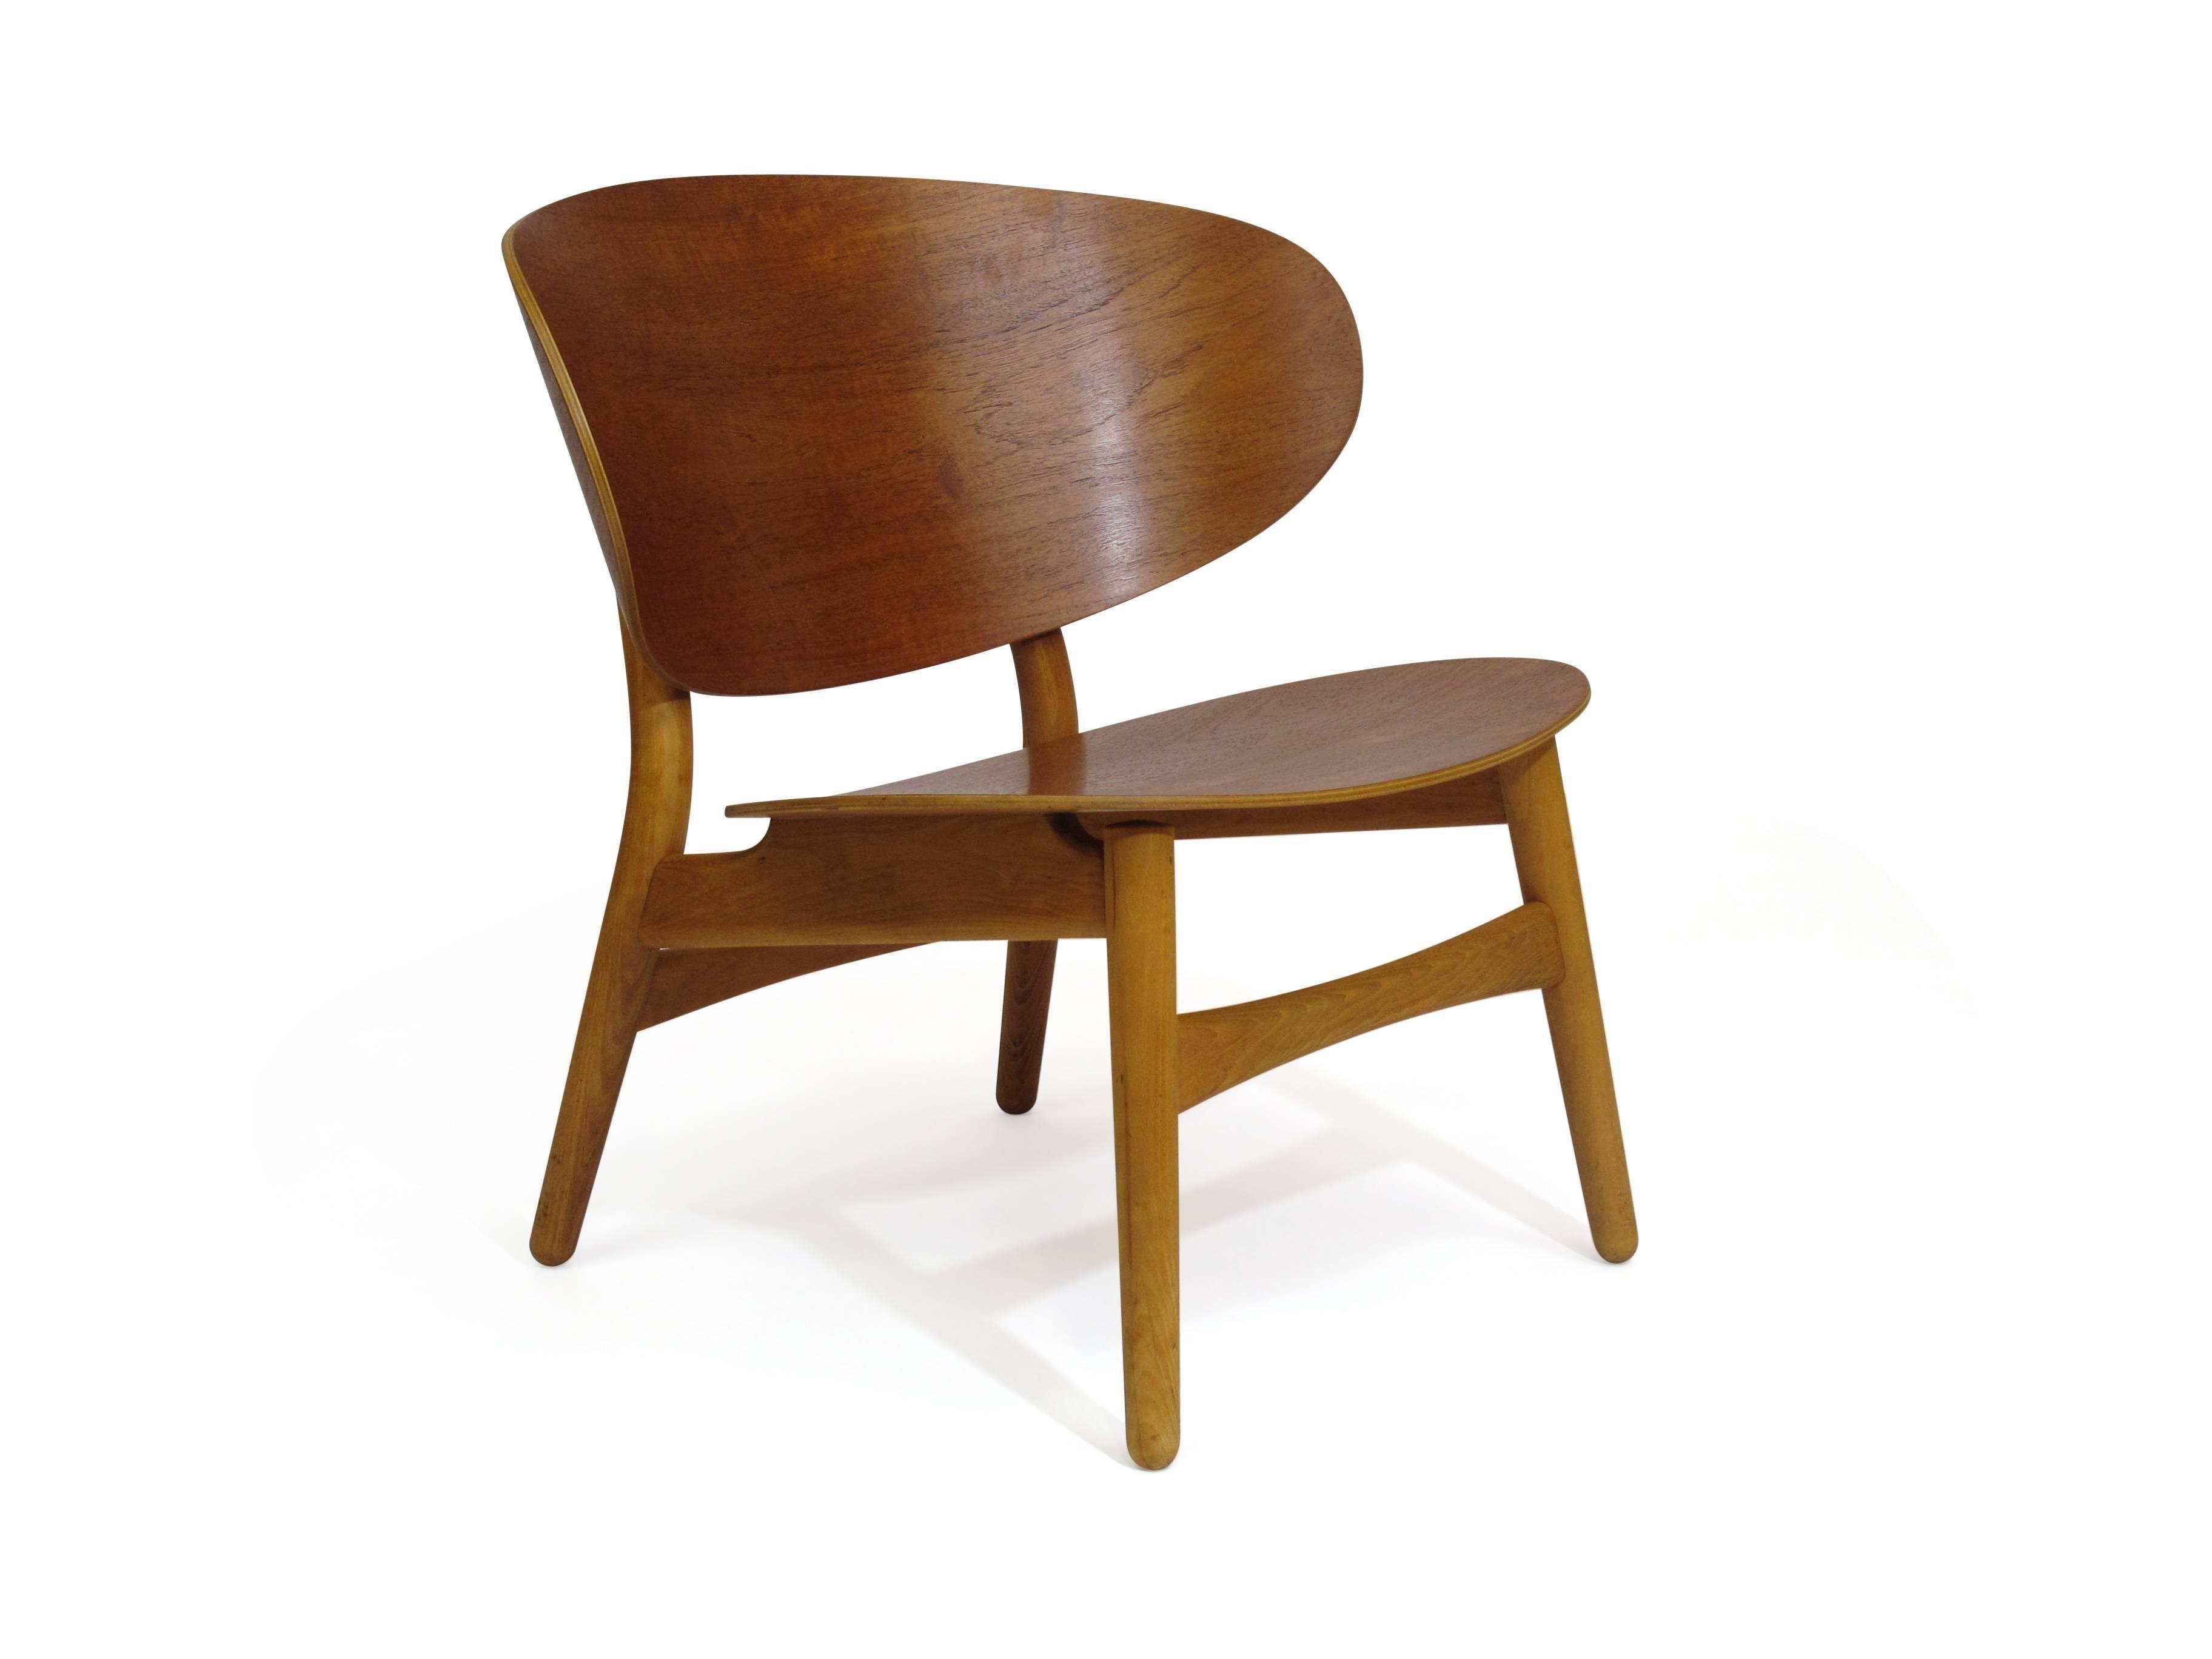 Scandinavian Modern Hans Wegner Teak Shell Chair FH, 1936 For Sale